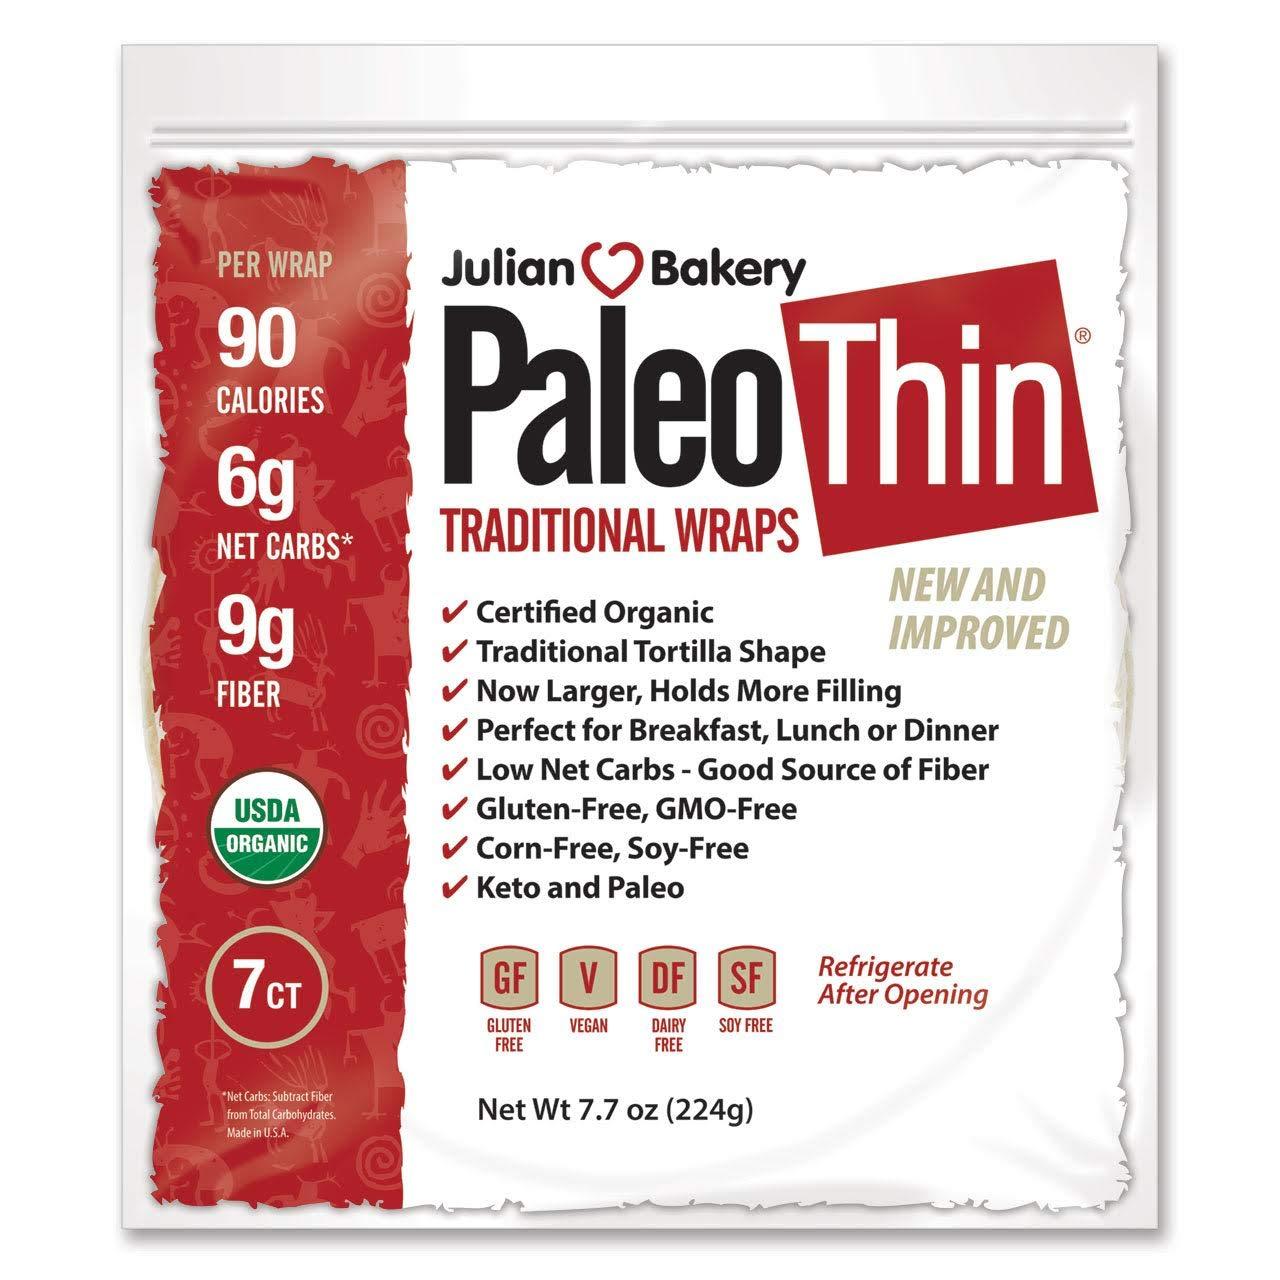 Paleo Thin Wrap USDA Organic (49 Individual Wraps) (Gluten Free & Low Net Carbs) VeganⓋ